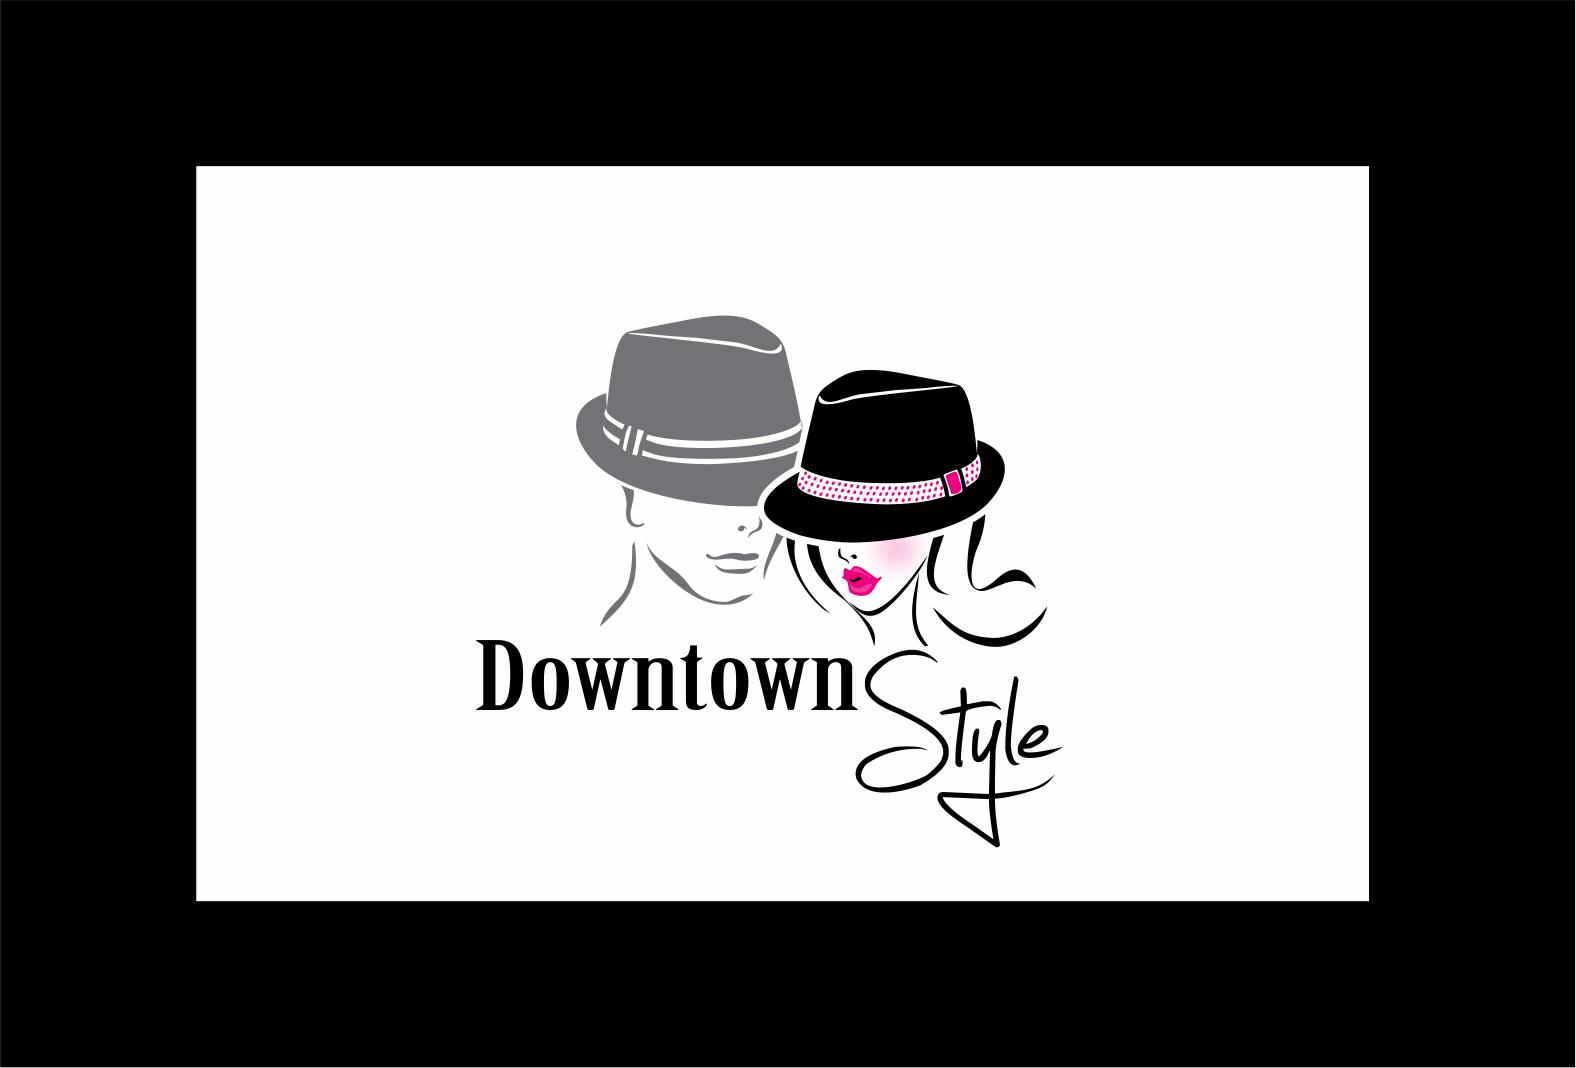 Fashion logo needed for urban hat brand